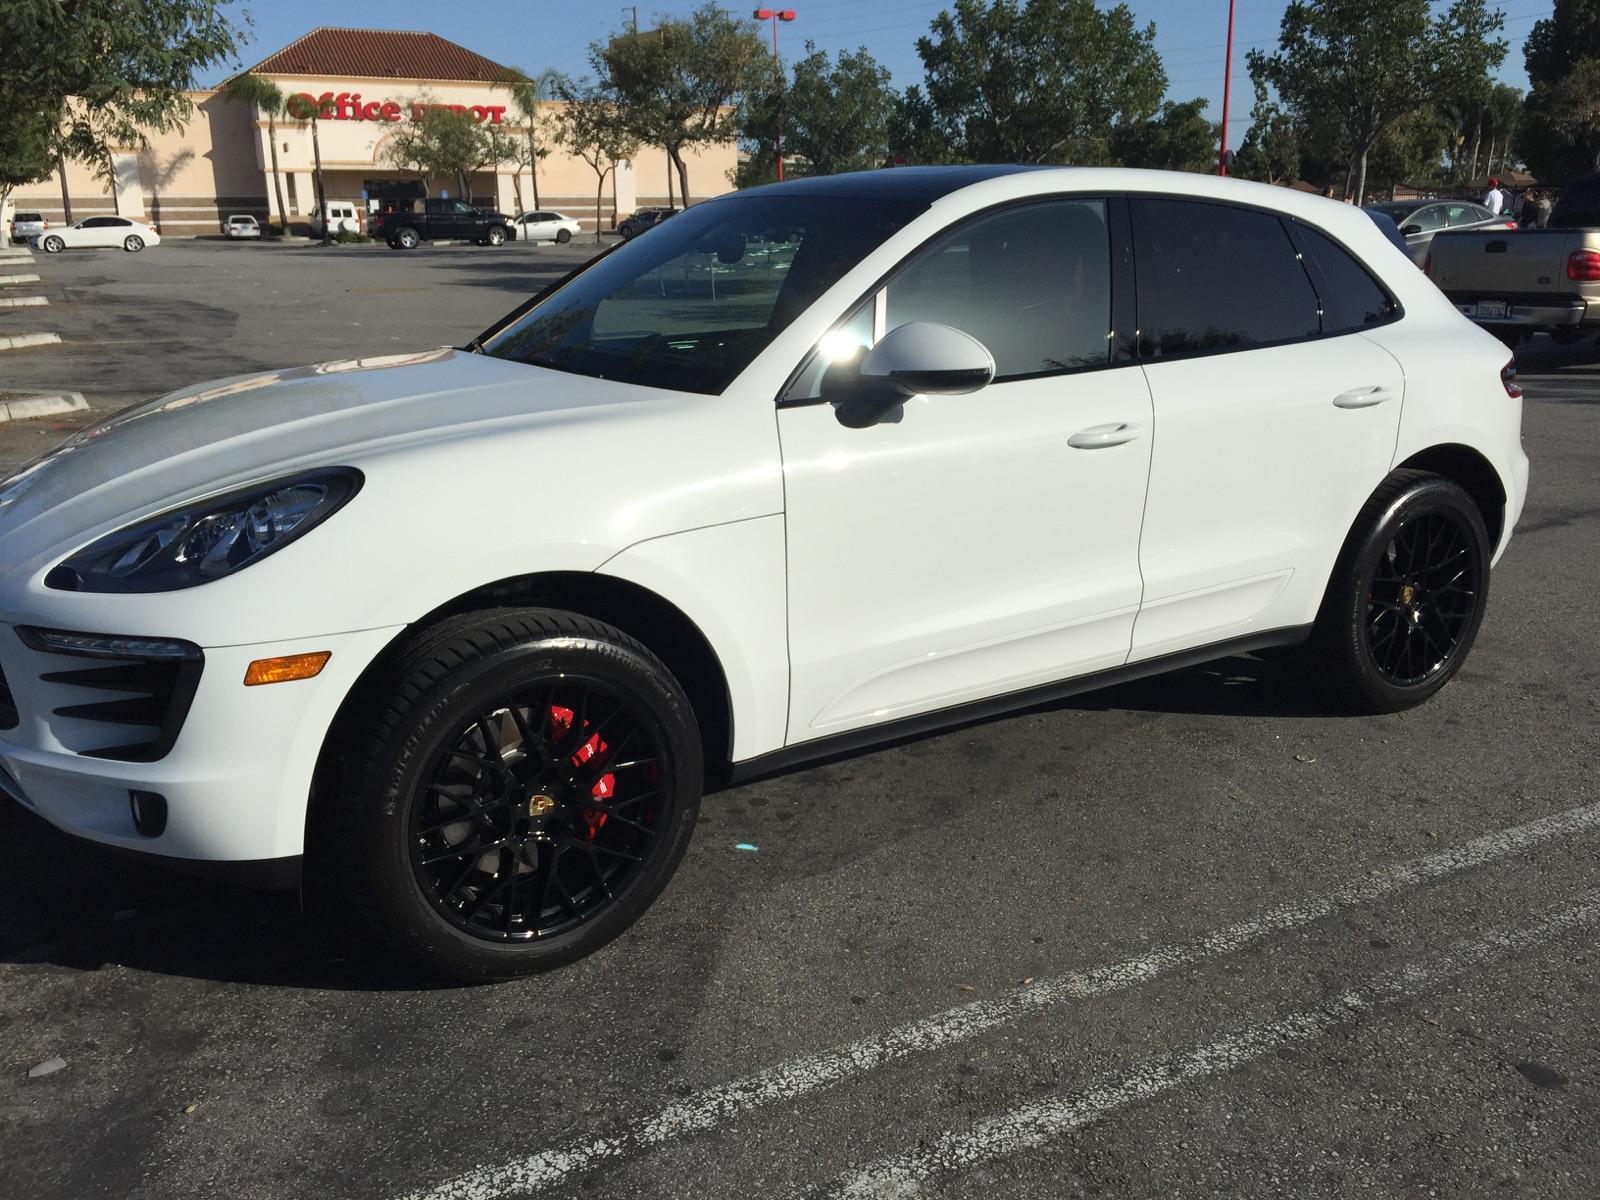 Porsche Macan Rims In Black Porsche Macan Forum